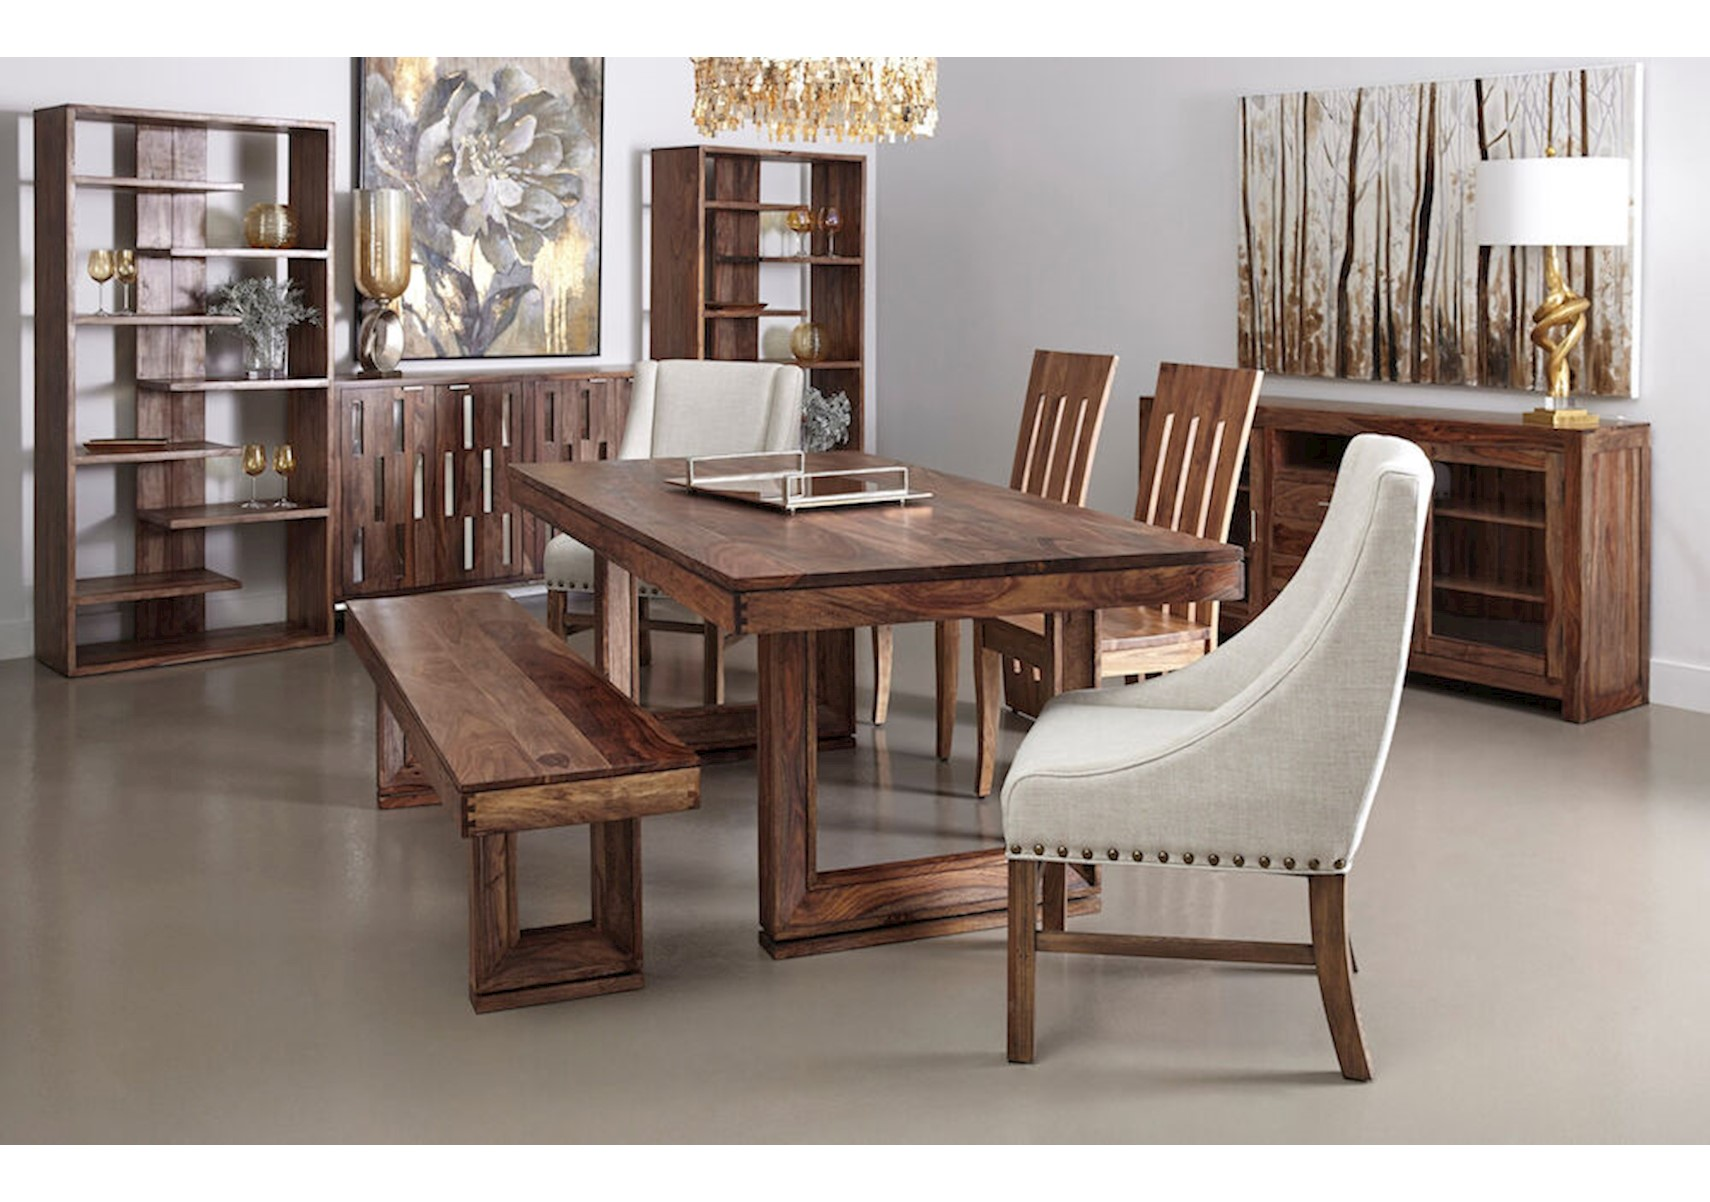 Lacks Brownstone 6 Pc Dining Room Set, 6 Piece Dining Room Set